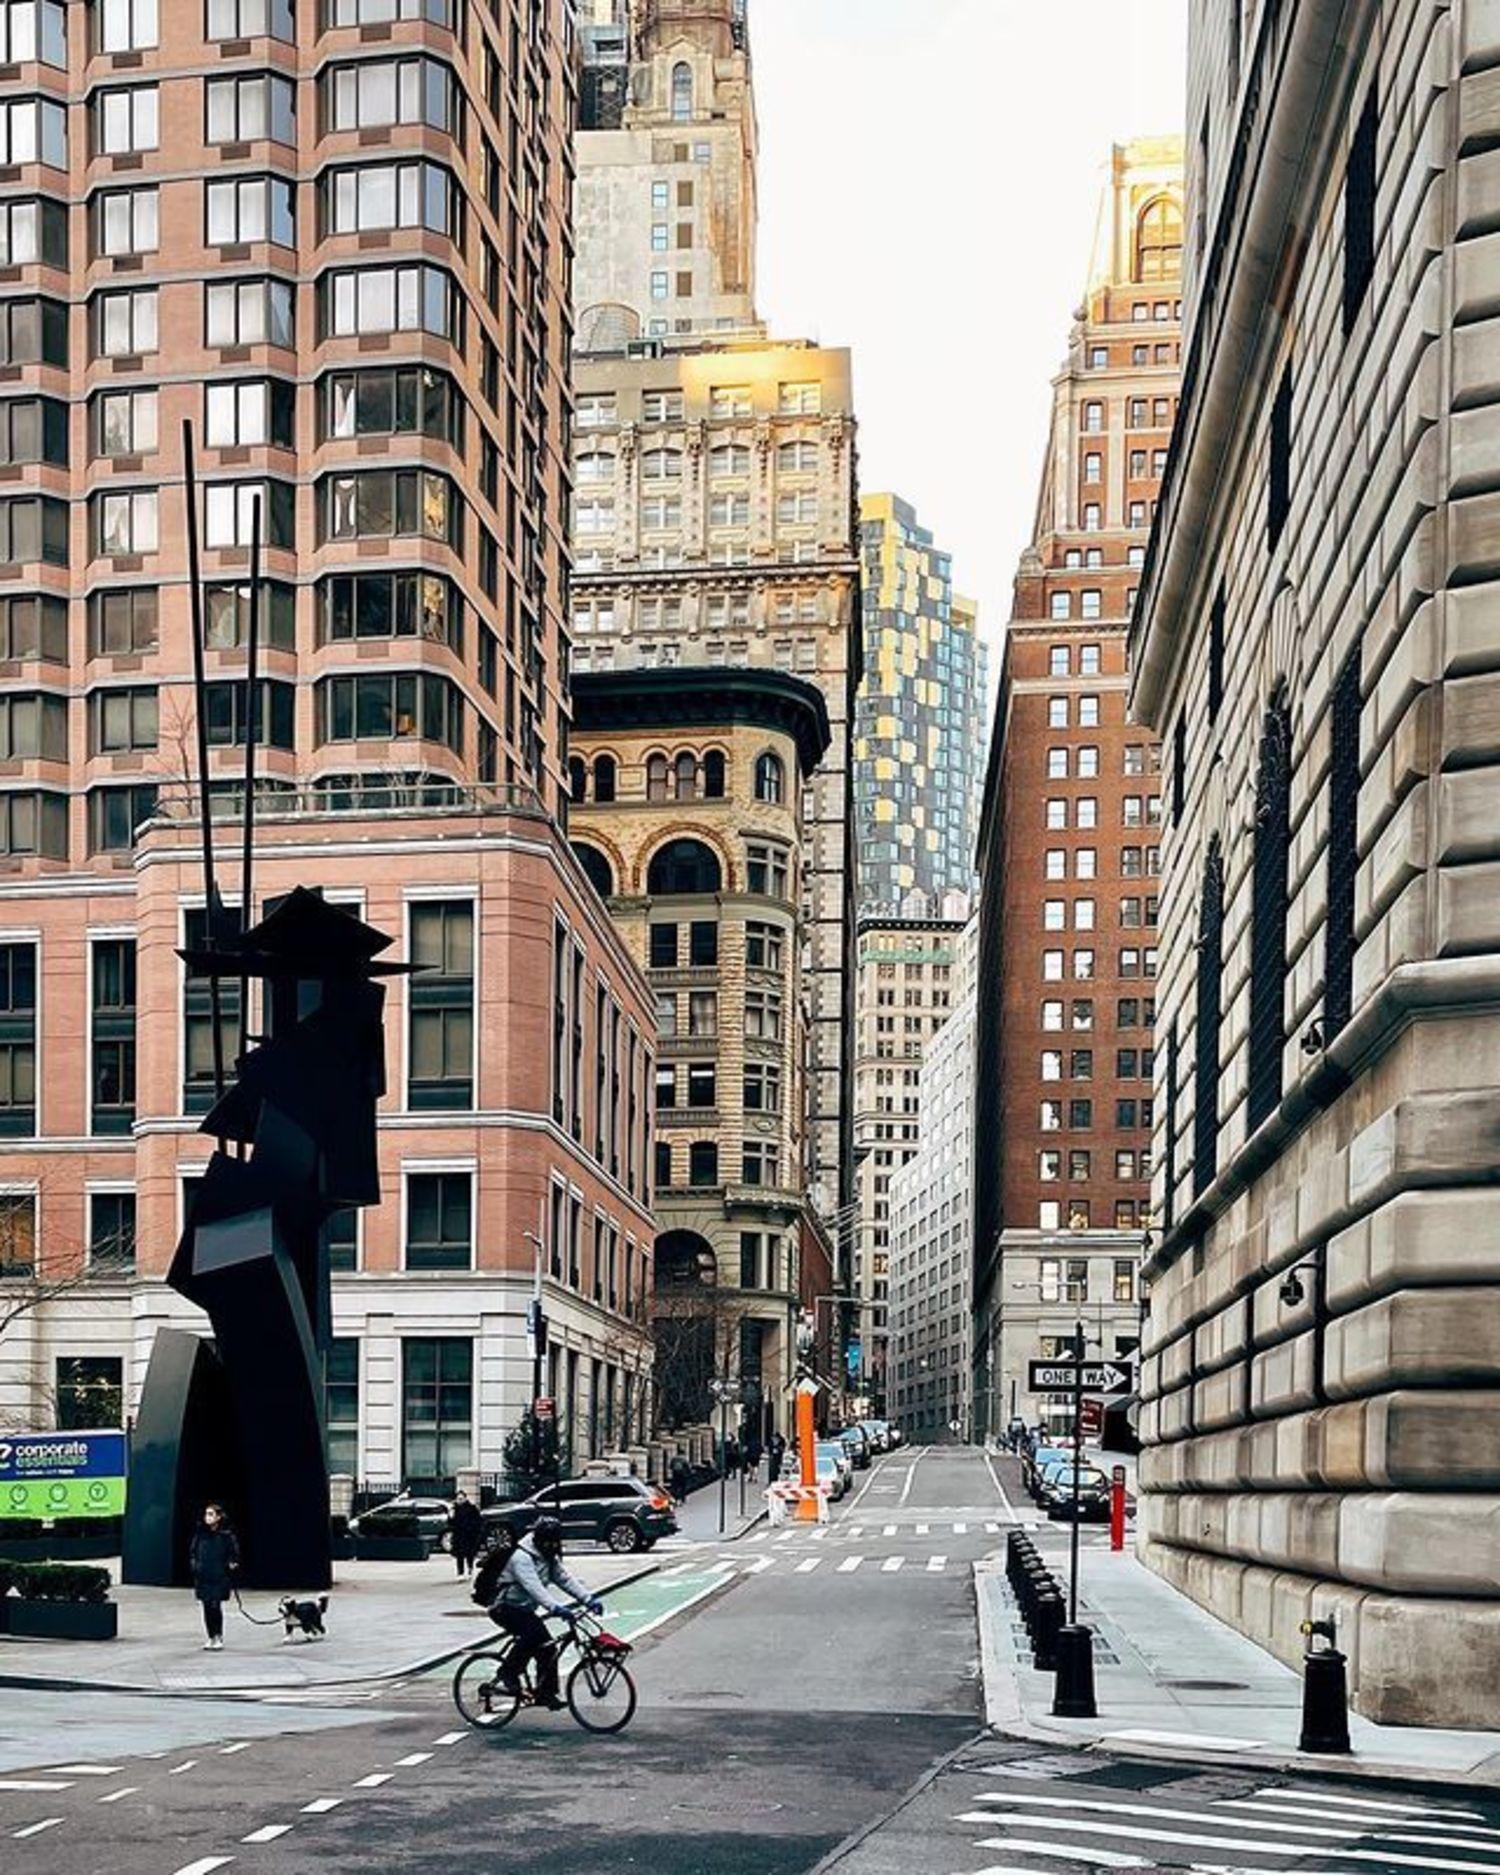 Louise Nevelson Plaza, Financial District, Manhattan